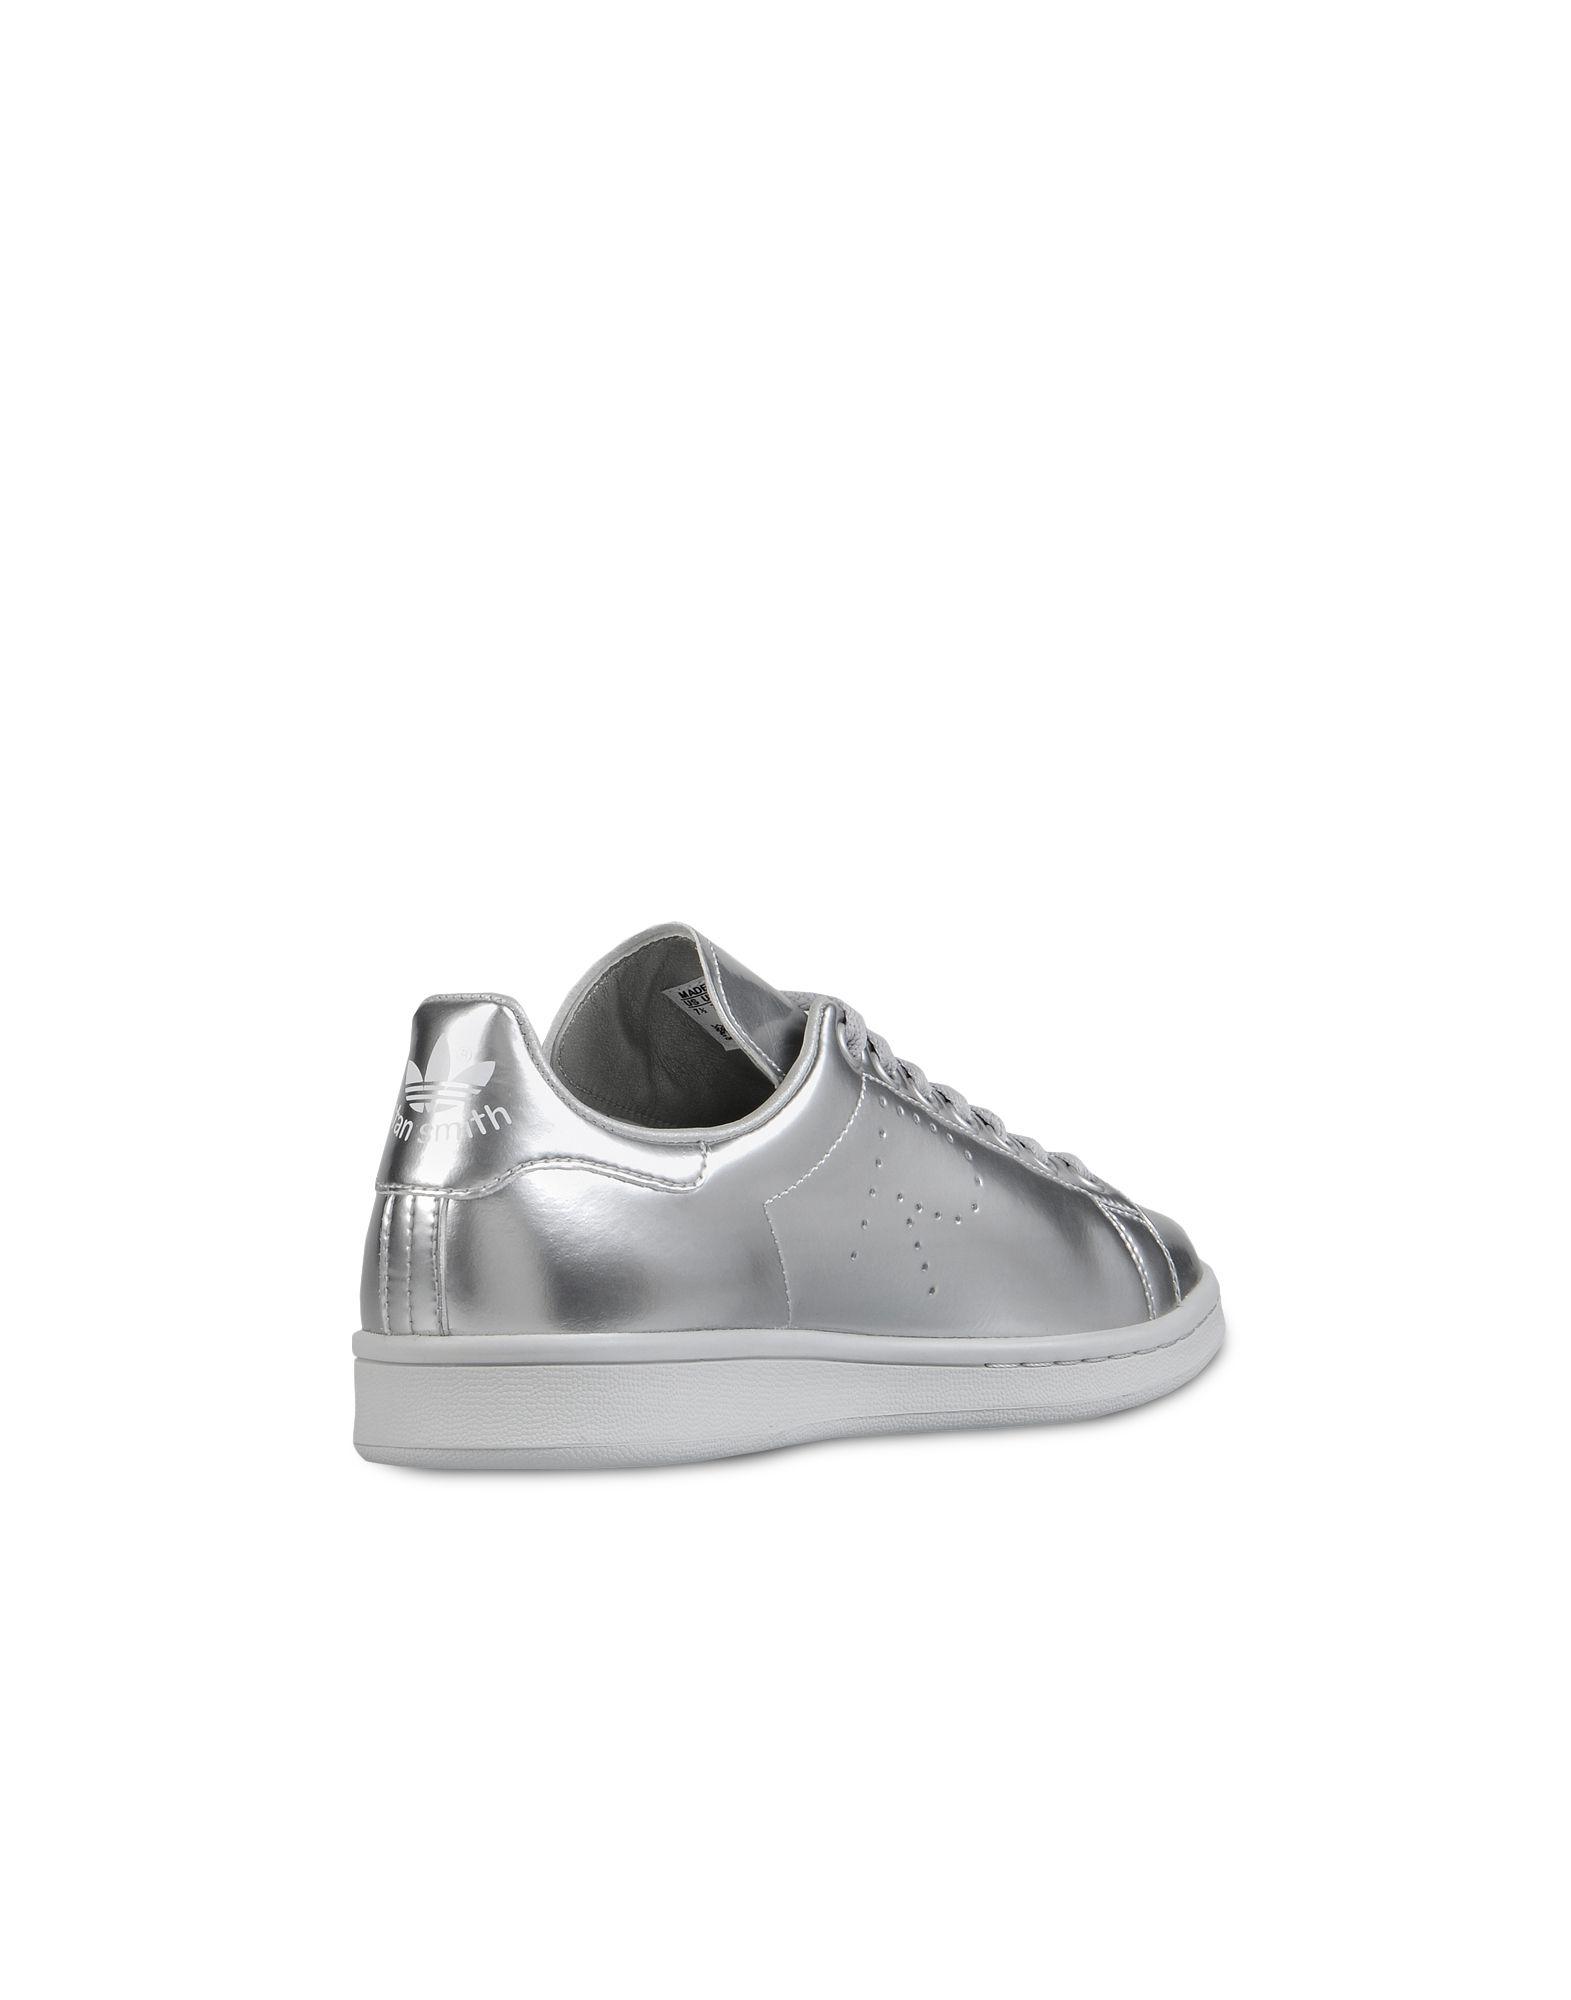 sneakers adidas x raf simons stan smith f r f r ihn. Black Bedroom Furniture Sets. Home Design Ideas